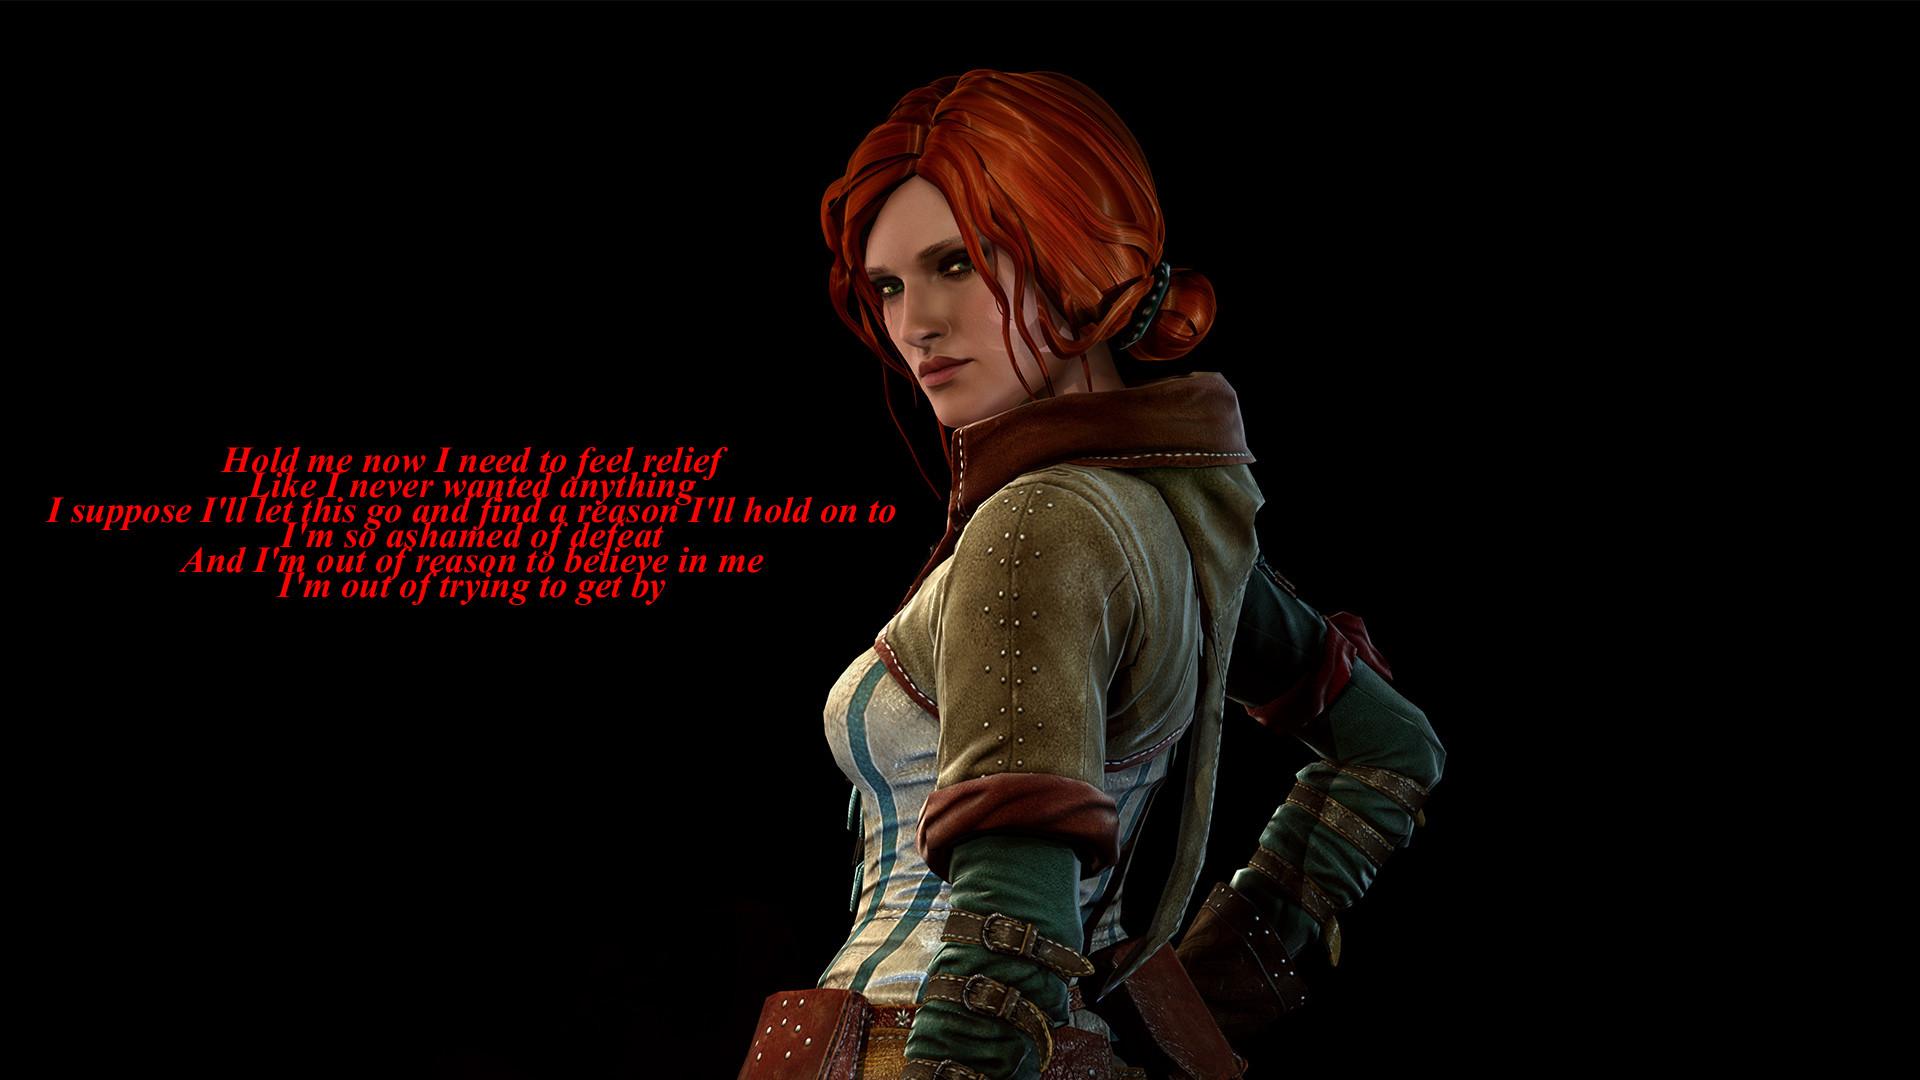 Video Game – The Witcher 3: Wild Hunt Triss Merigold Wallpaper